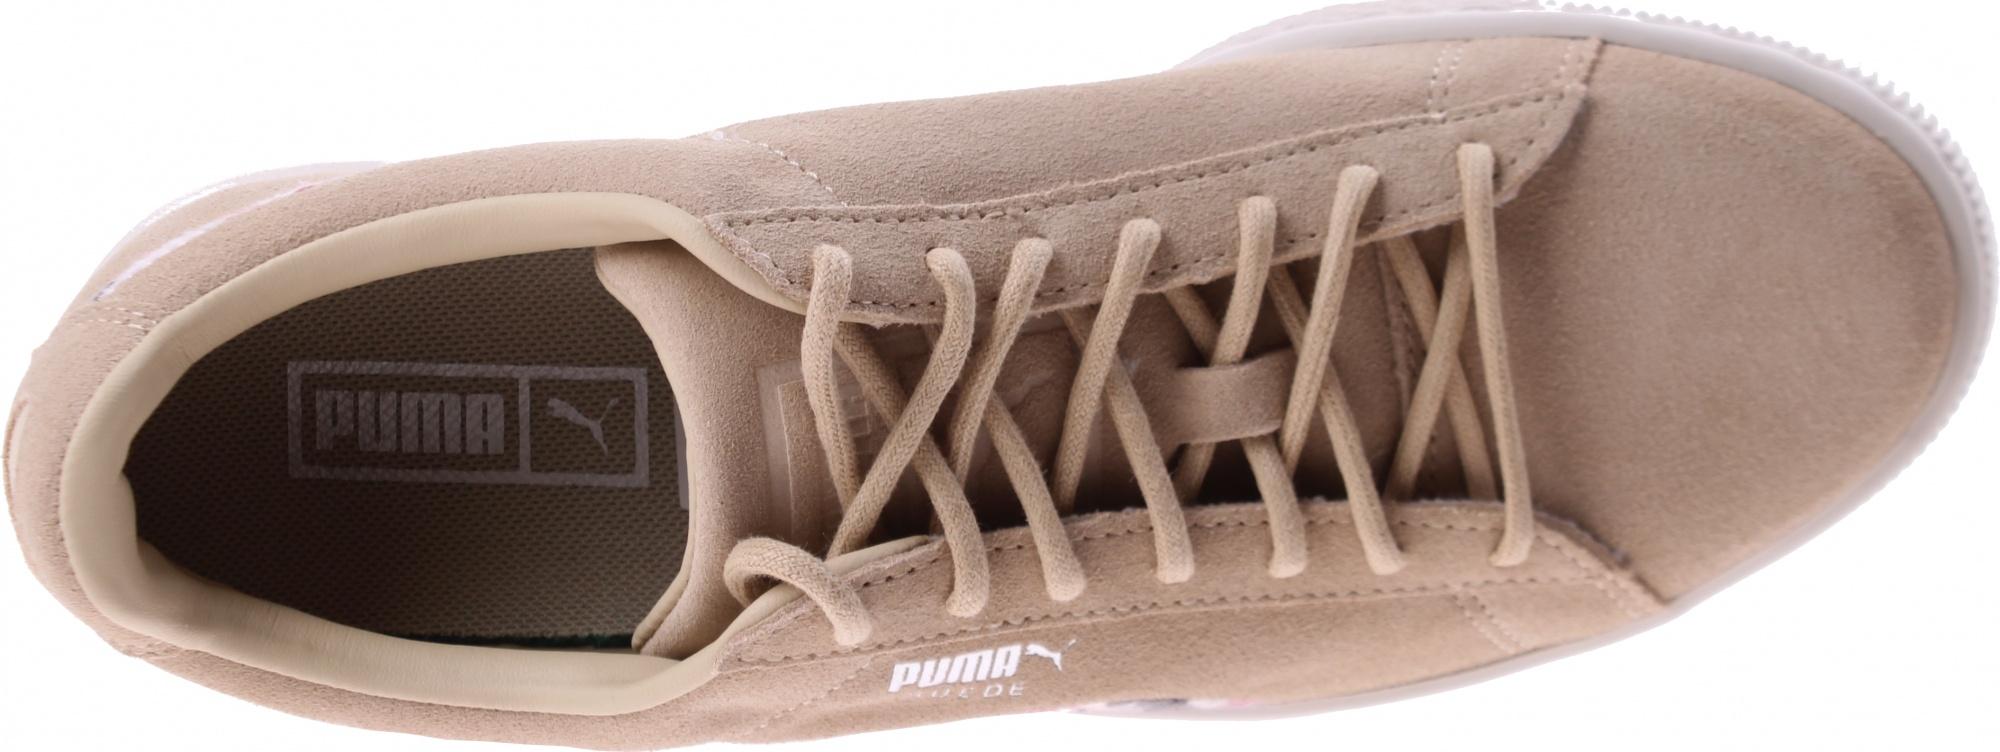 cheap for discount c3044 ccfbe Puma sneakers Suede Sunfade Stitch women beige - Internet ...